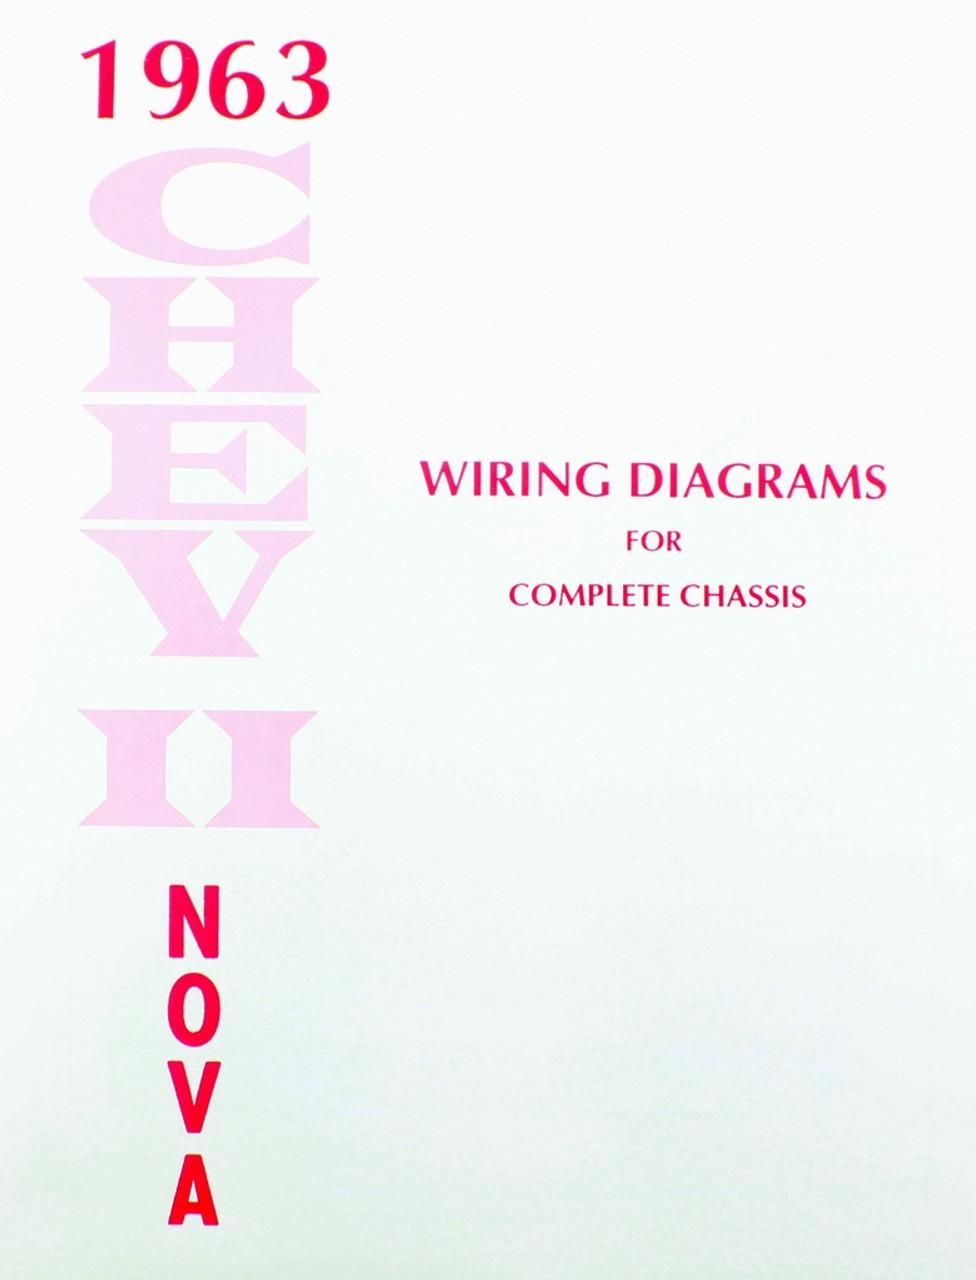 63 1963 chevy nova electrical wiring diagram manual i 5 classic chevy rh i5chevy com 64 nova wiring diagram 64 nova wiring diagram